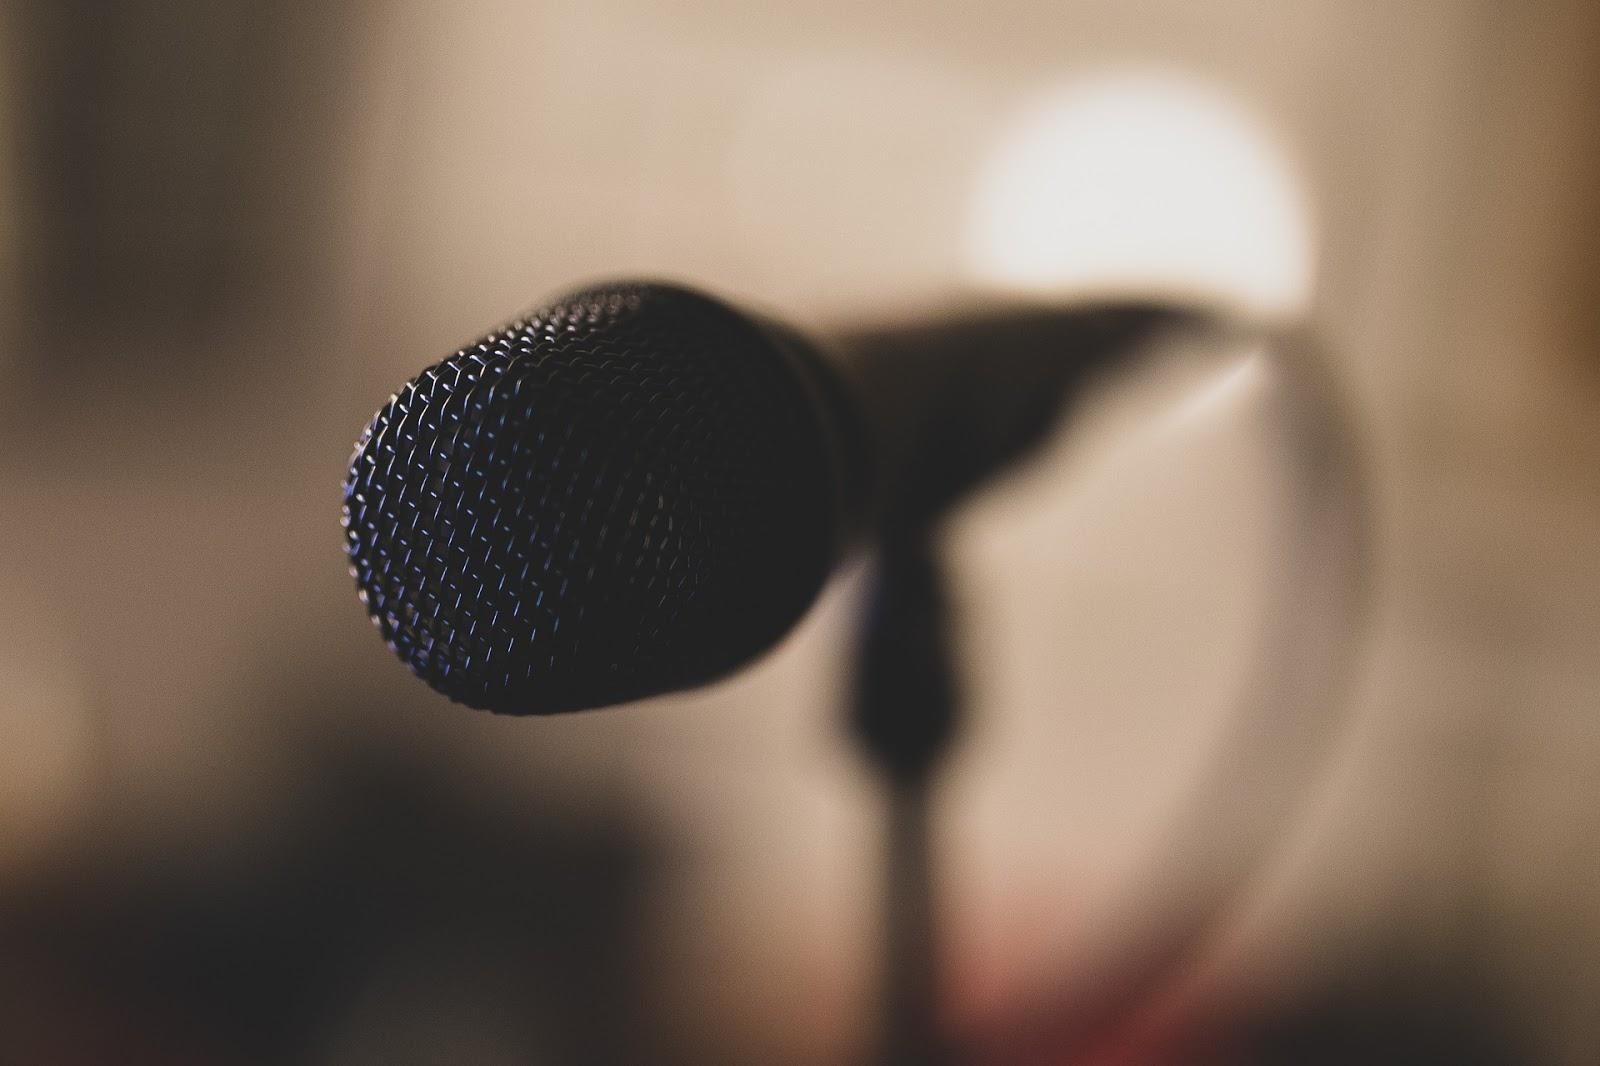 microphone-4274532_1920.jpg